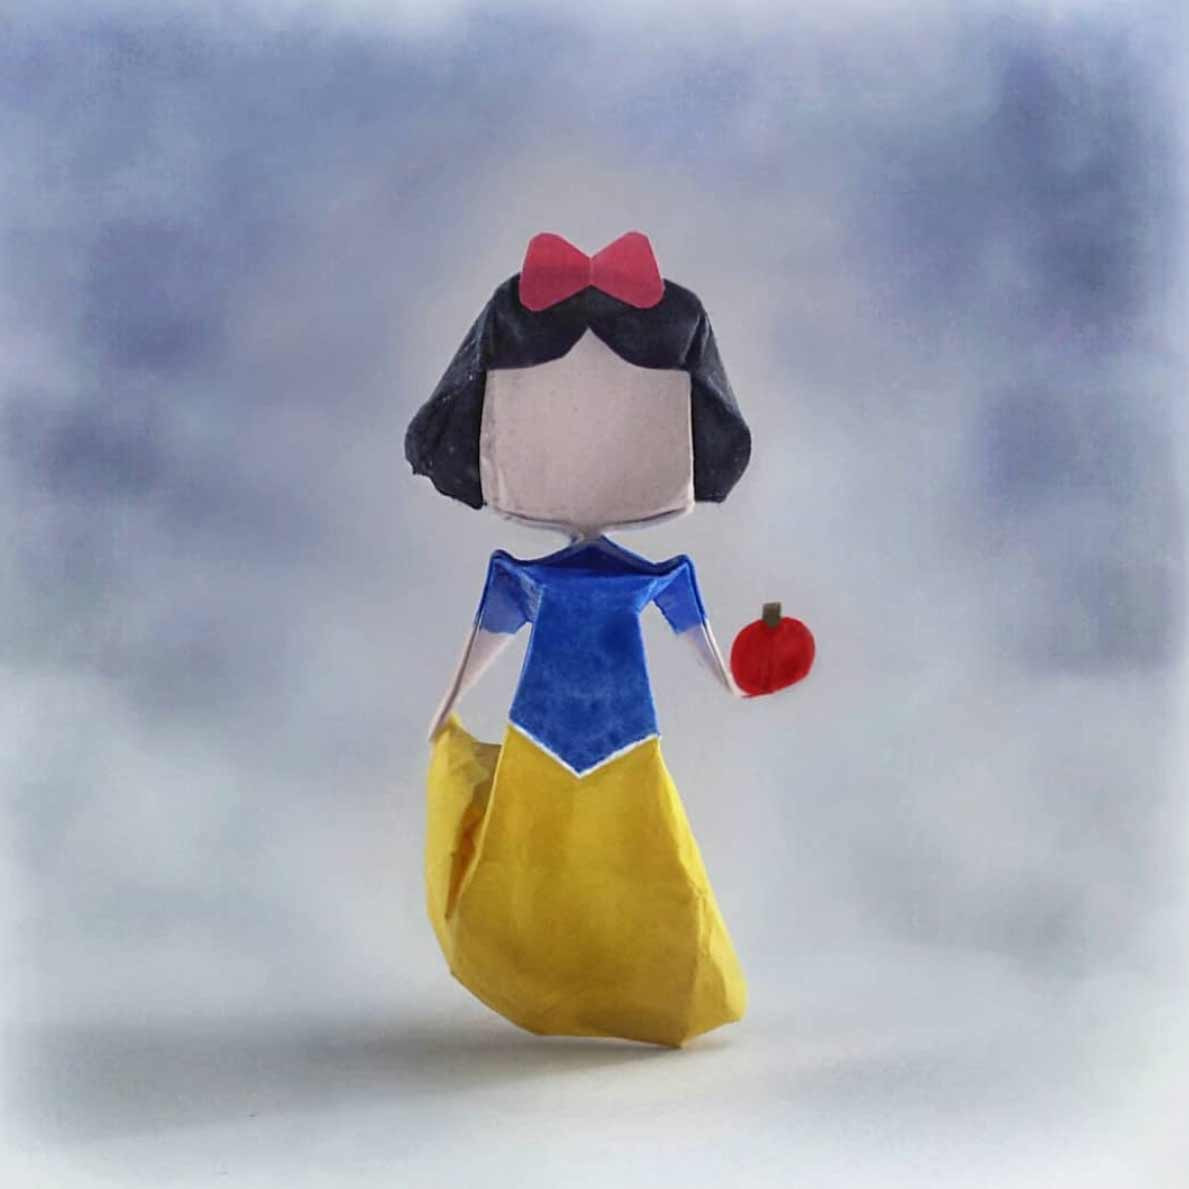 Popkultur-Origami-Figuren von Louise Cassidy origami-figuren-Louise-Cassidy_13